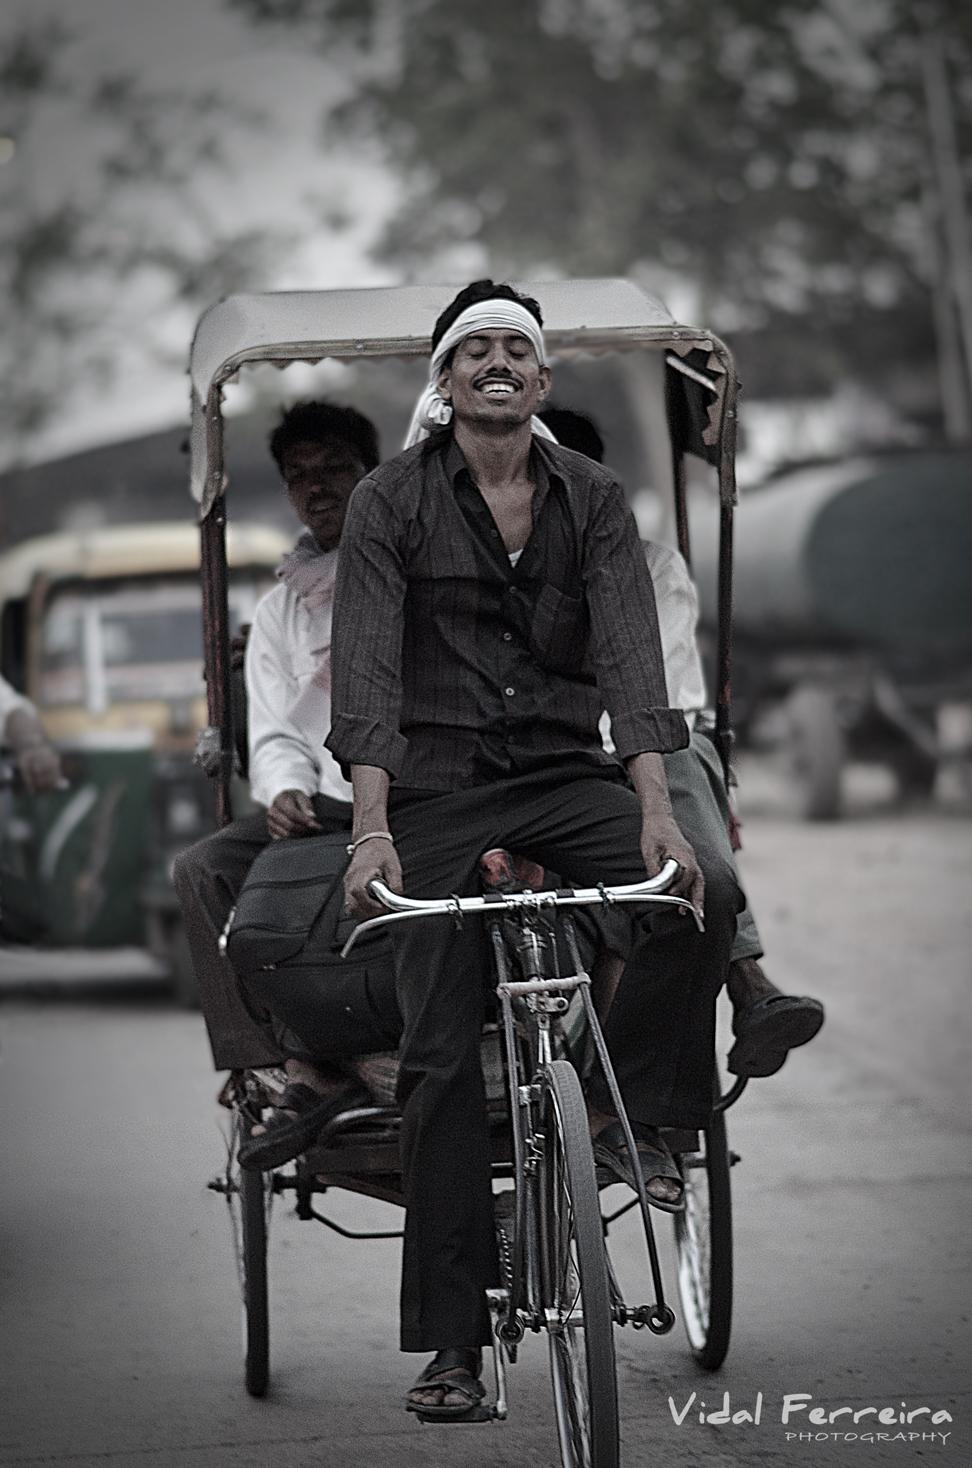 Freedom - New Delhi, India